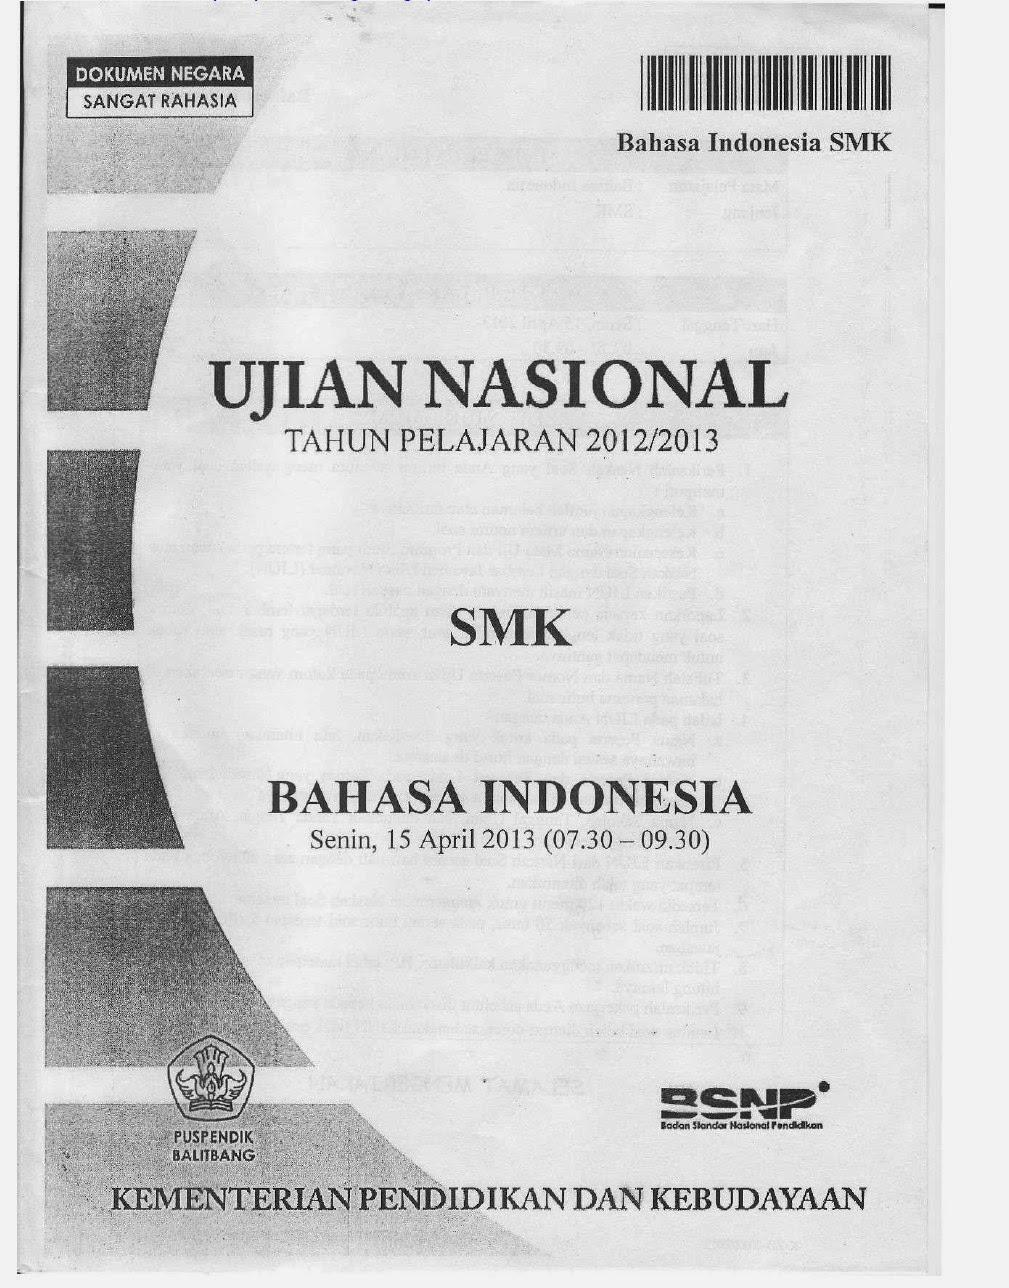 Soal UN Bahasa Indonesia  SMK Tahun 2013